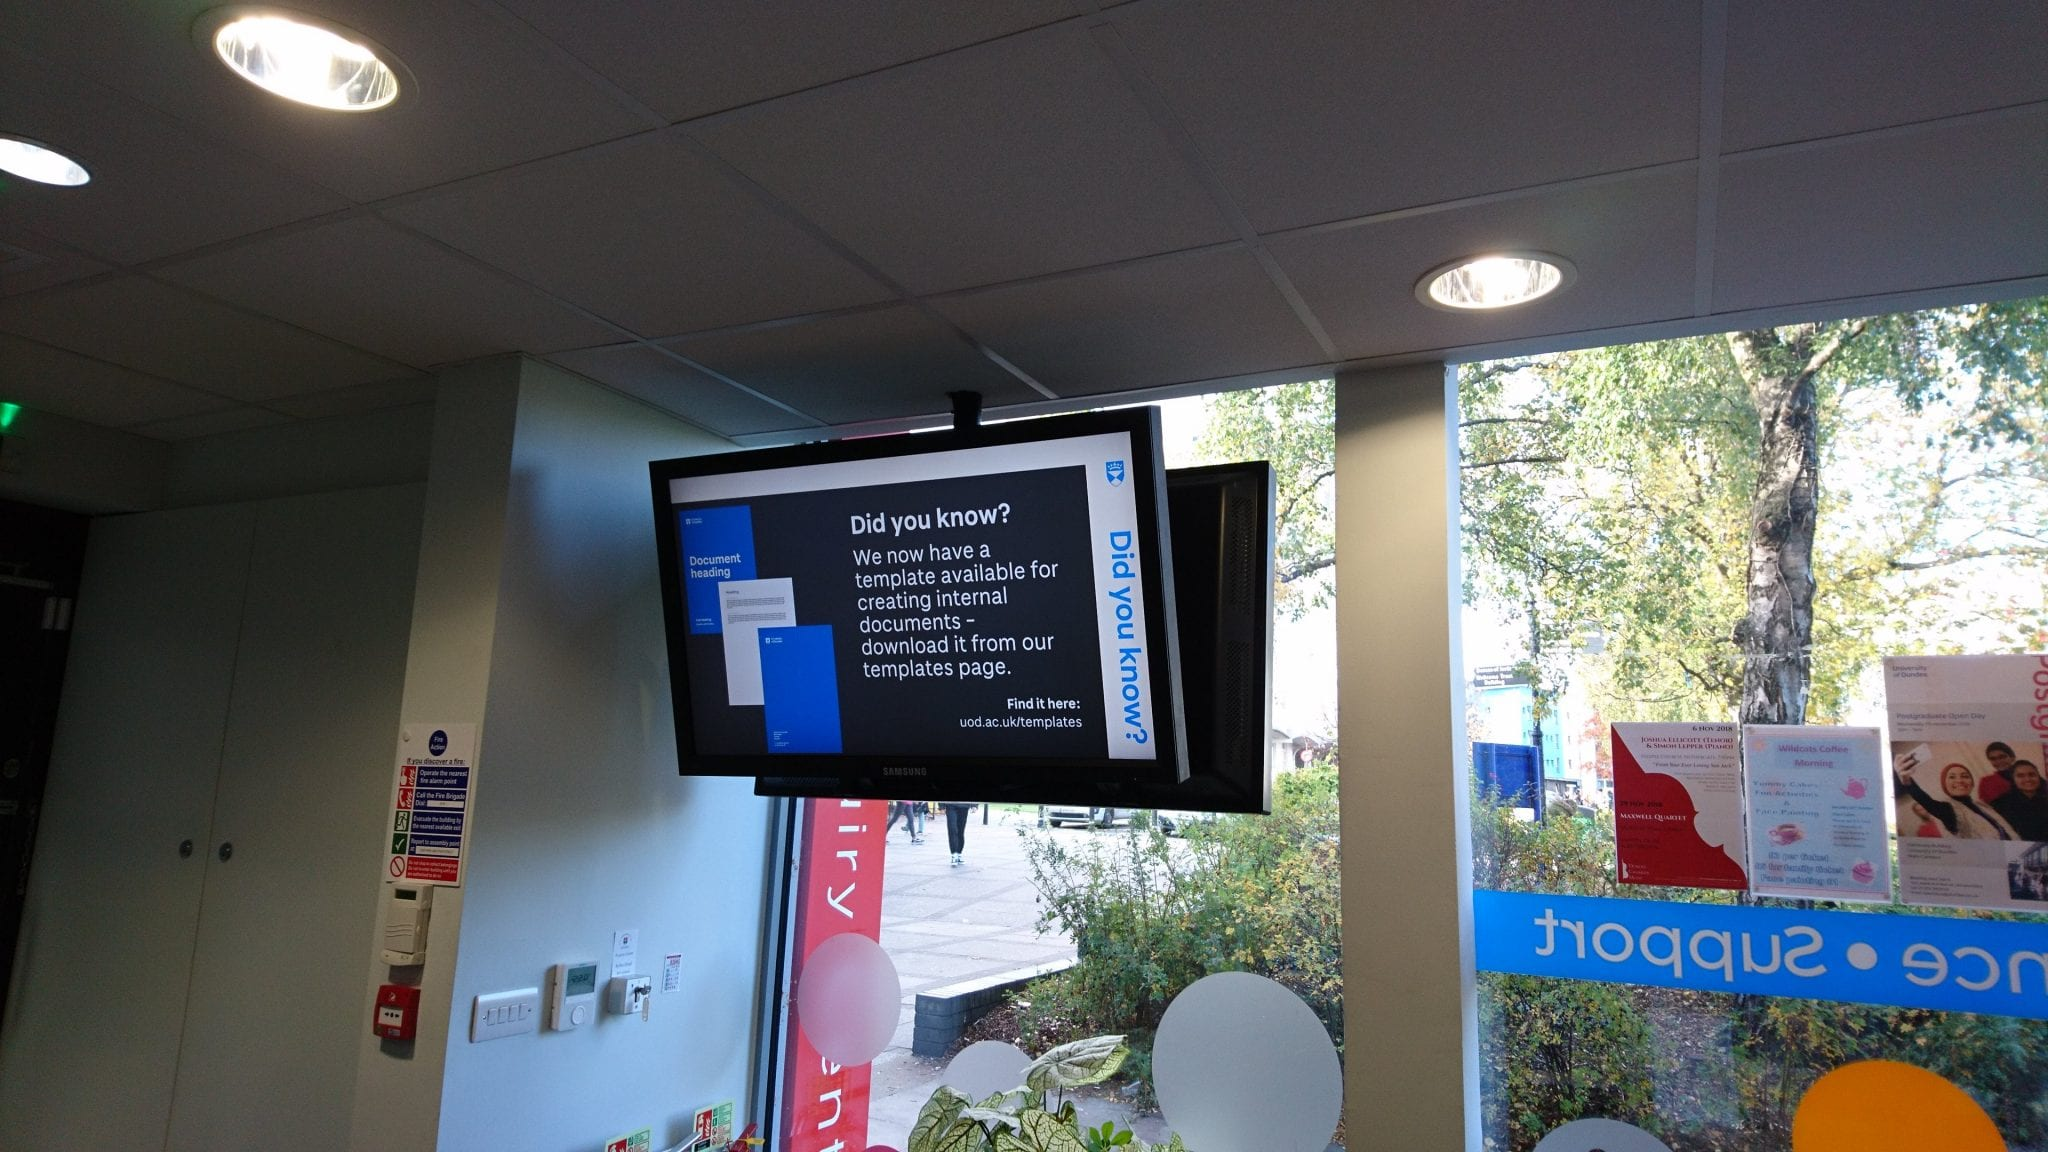 Digital signage inside the Enquiry Centre